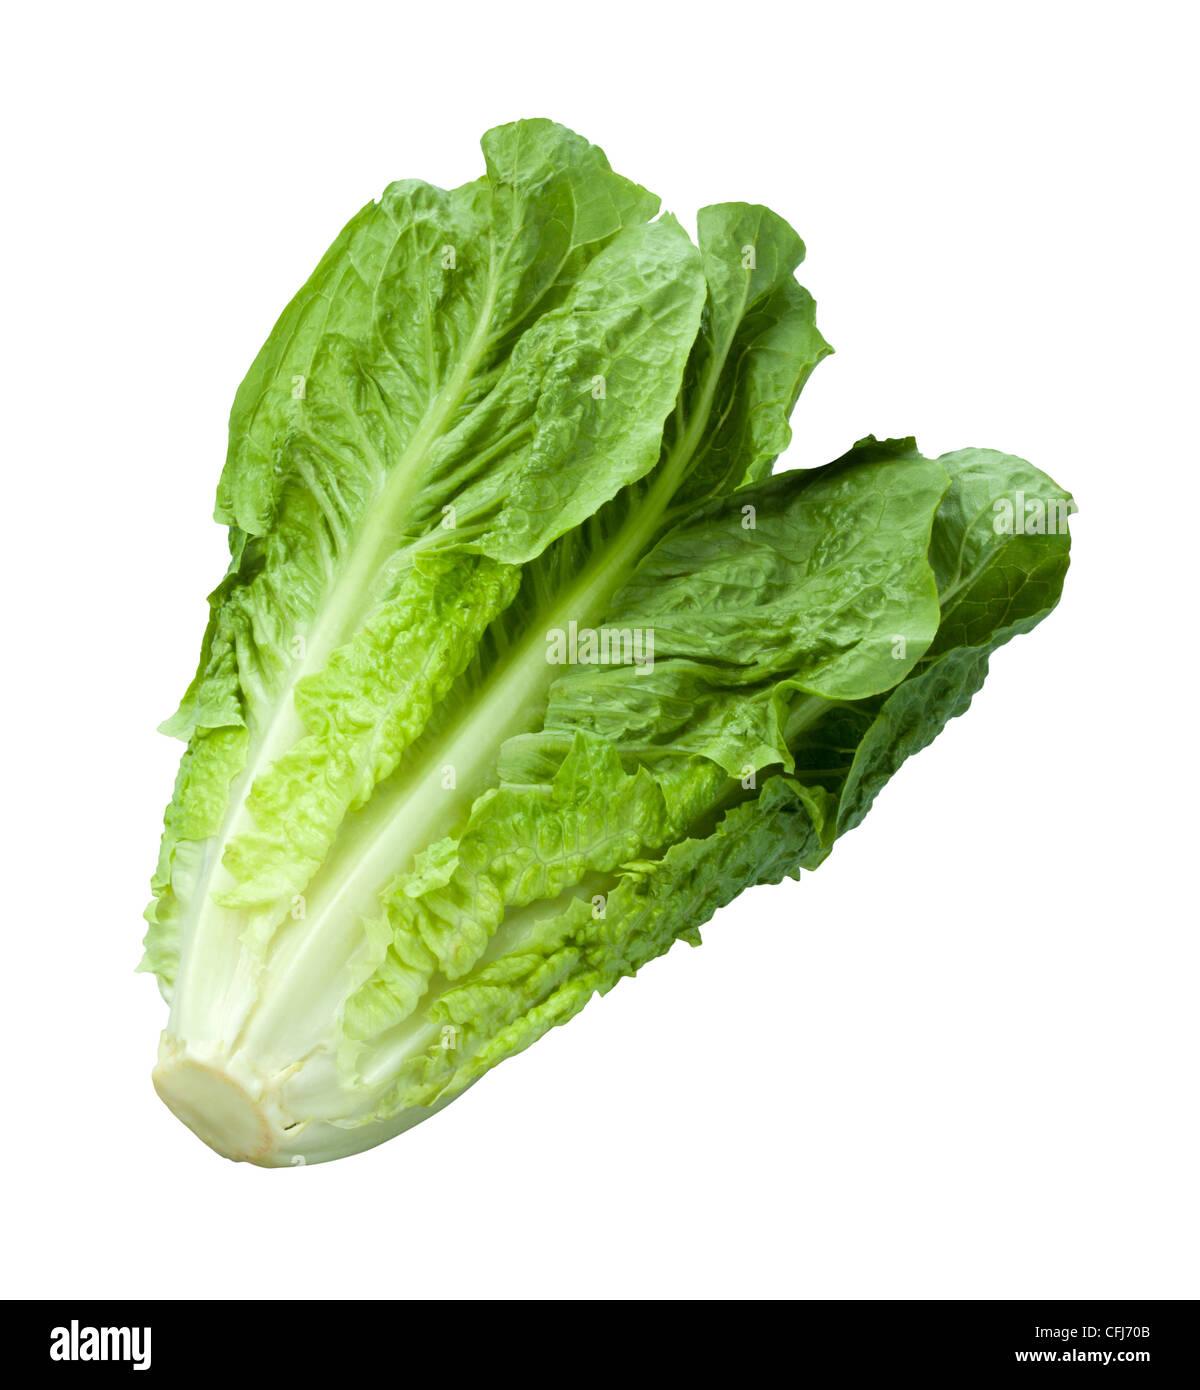 Romaine Lettuce isolated on white - Stock Image